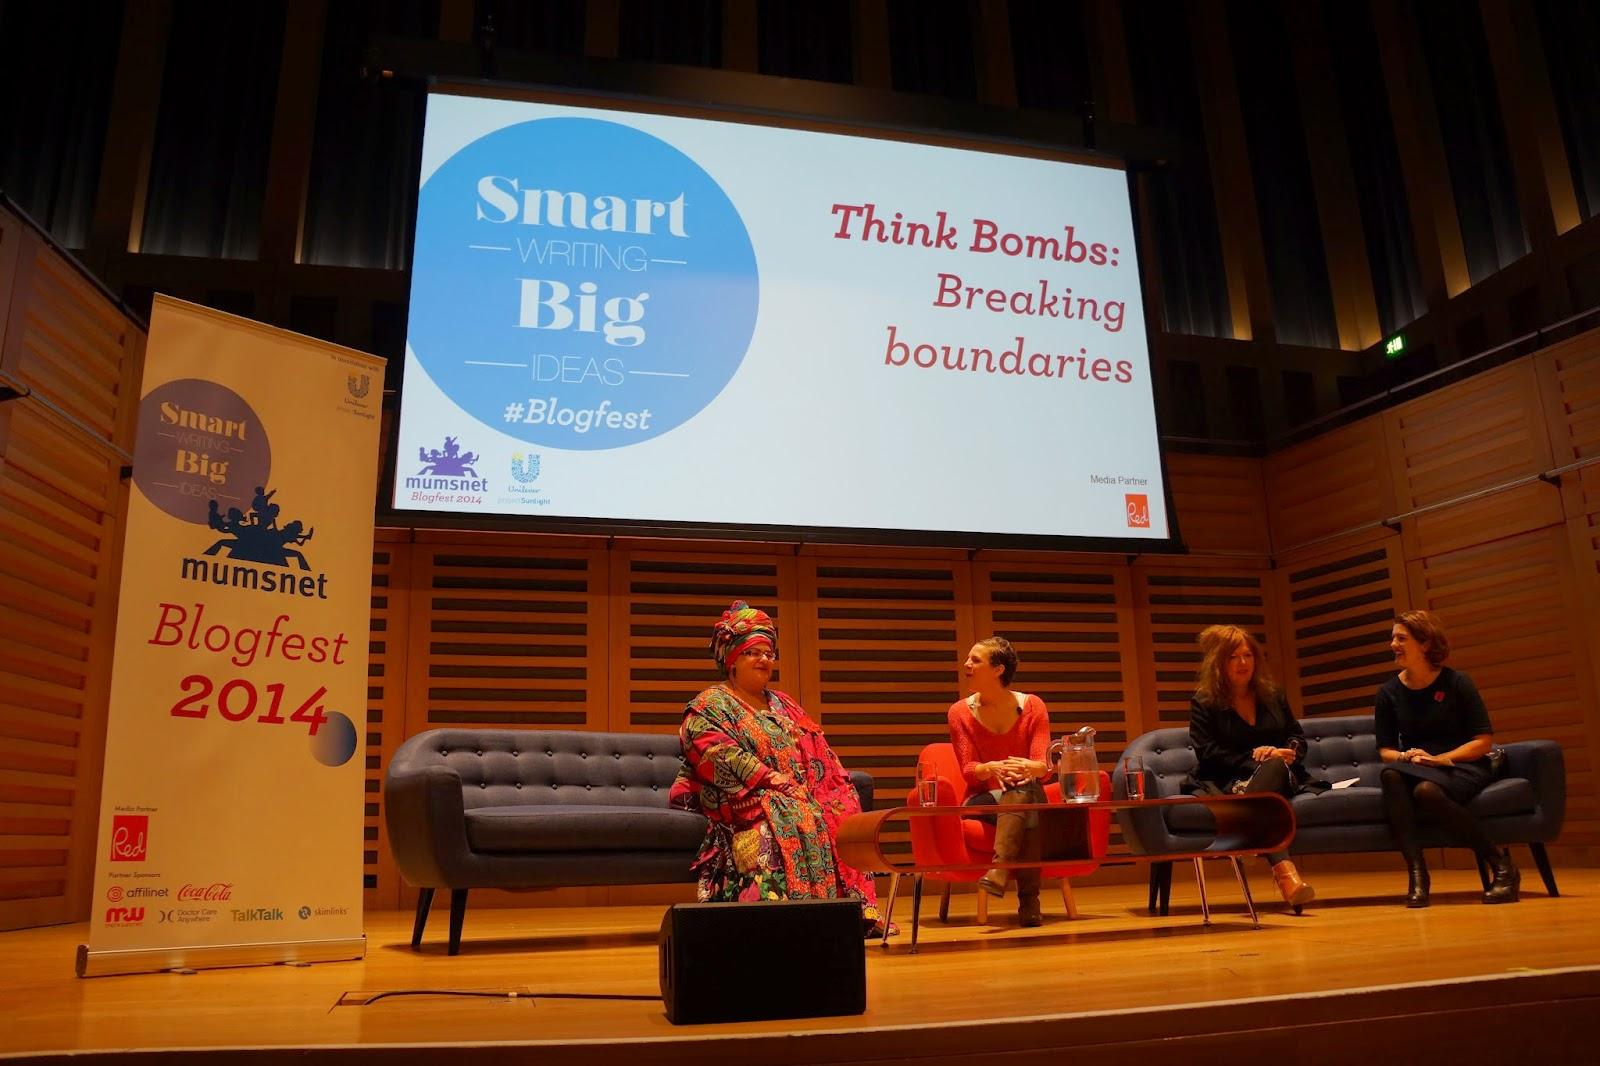 mumsnet blogfest 2014 think bombs